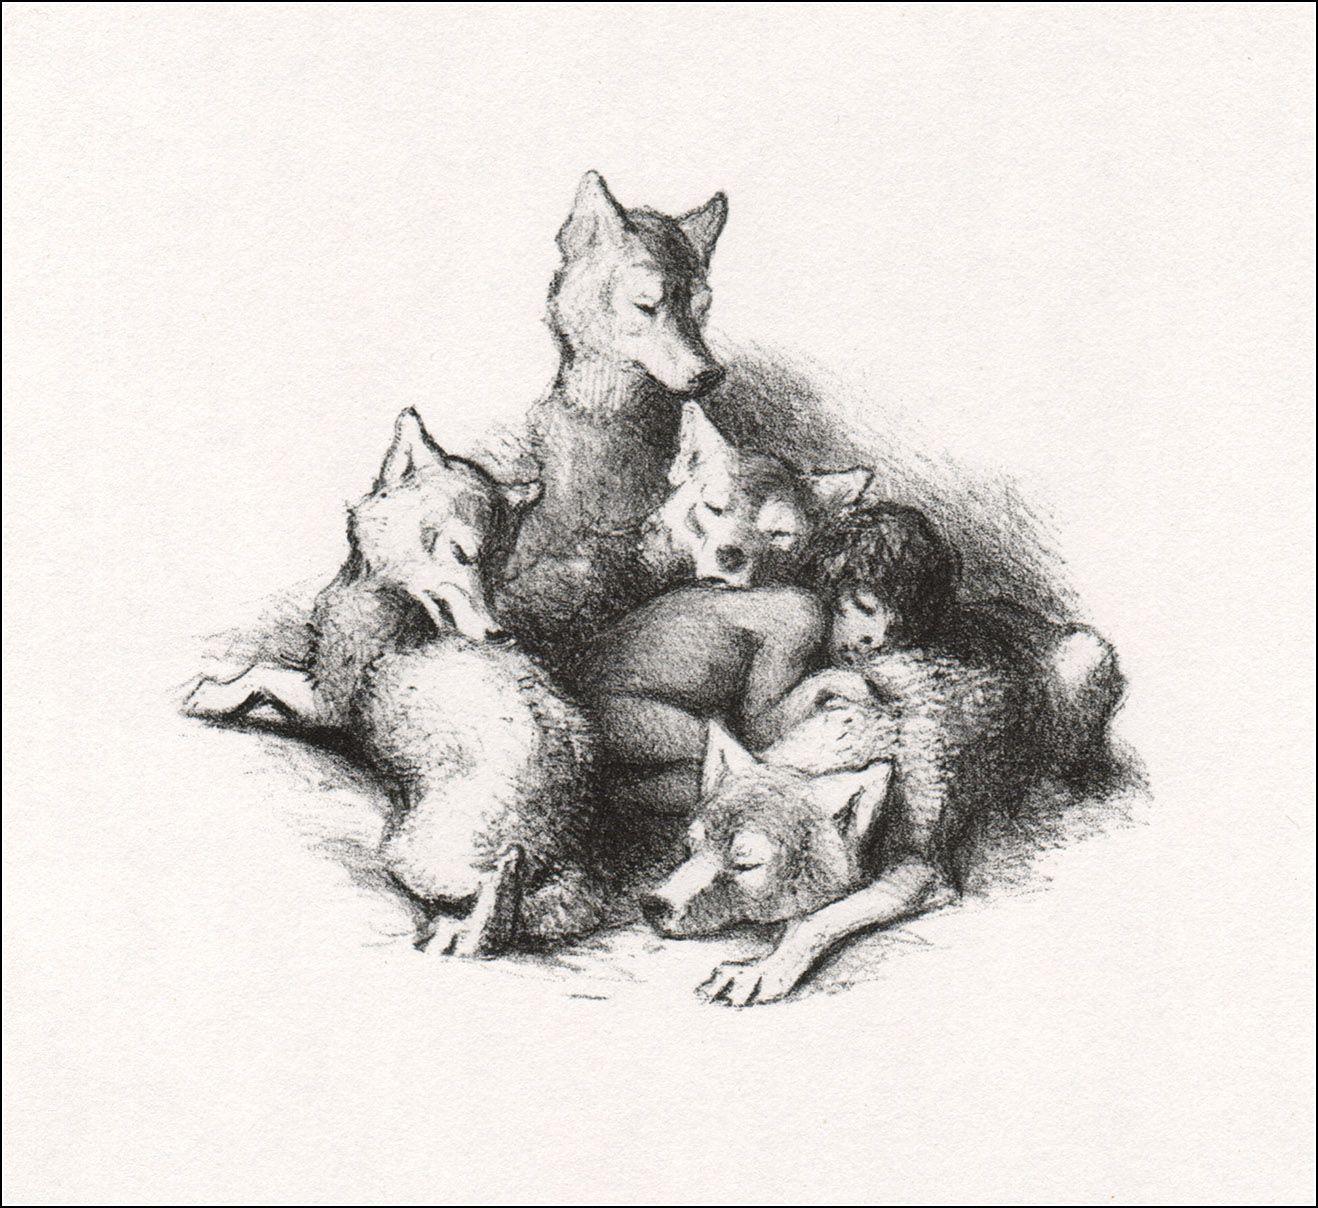 Mowgli. ISBN 9785392016280; 2011. Illustrator Vasily